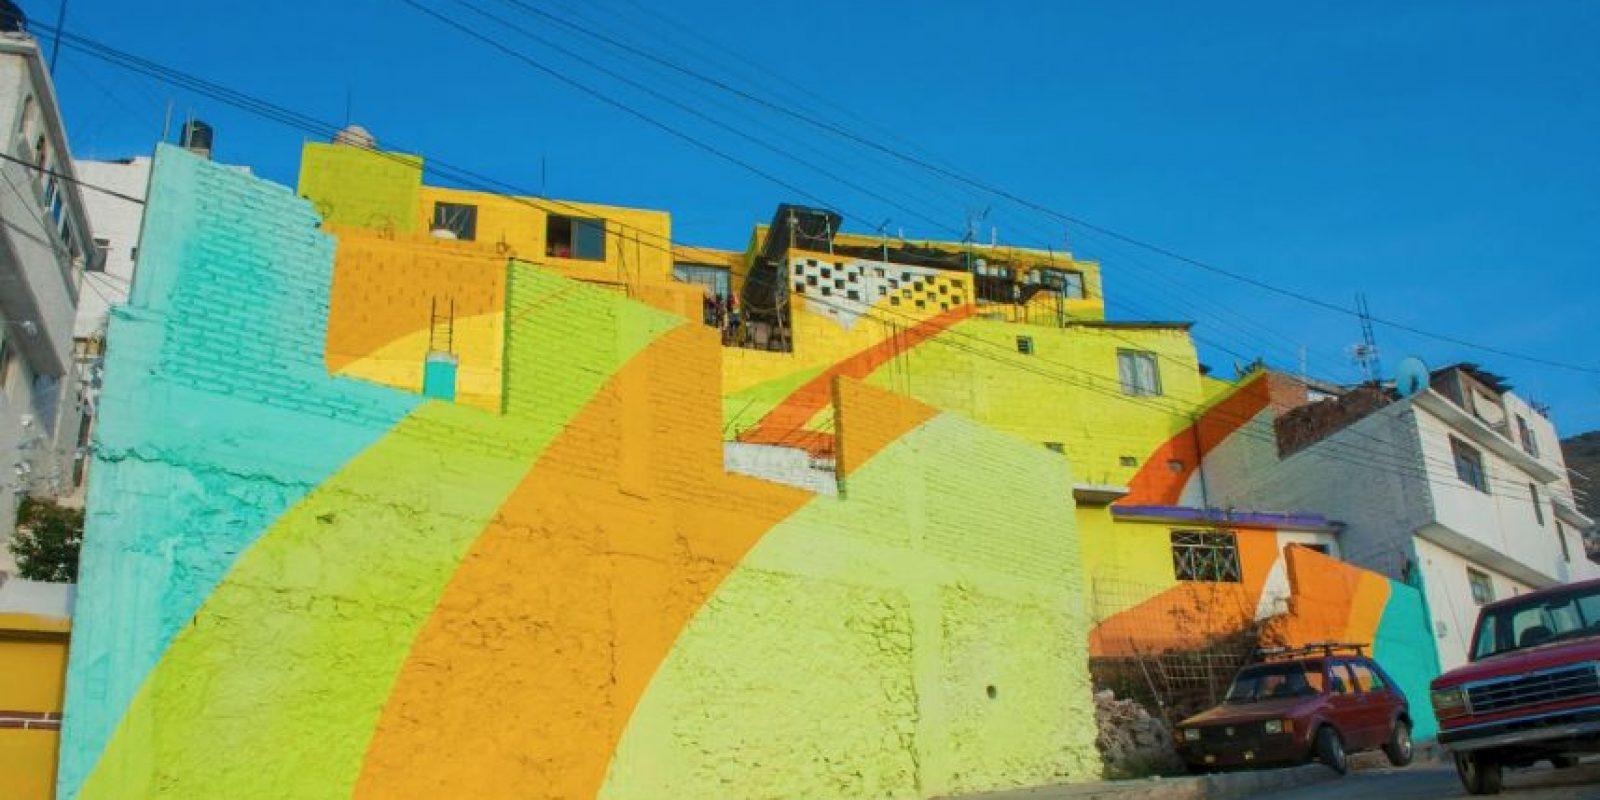 Se pintaron 20 mil metros cuadrados de fachadas de 209 casa. Foto:Vía facebook.com/muralismogermen